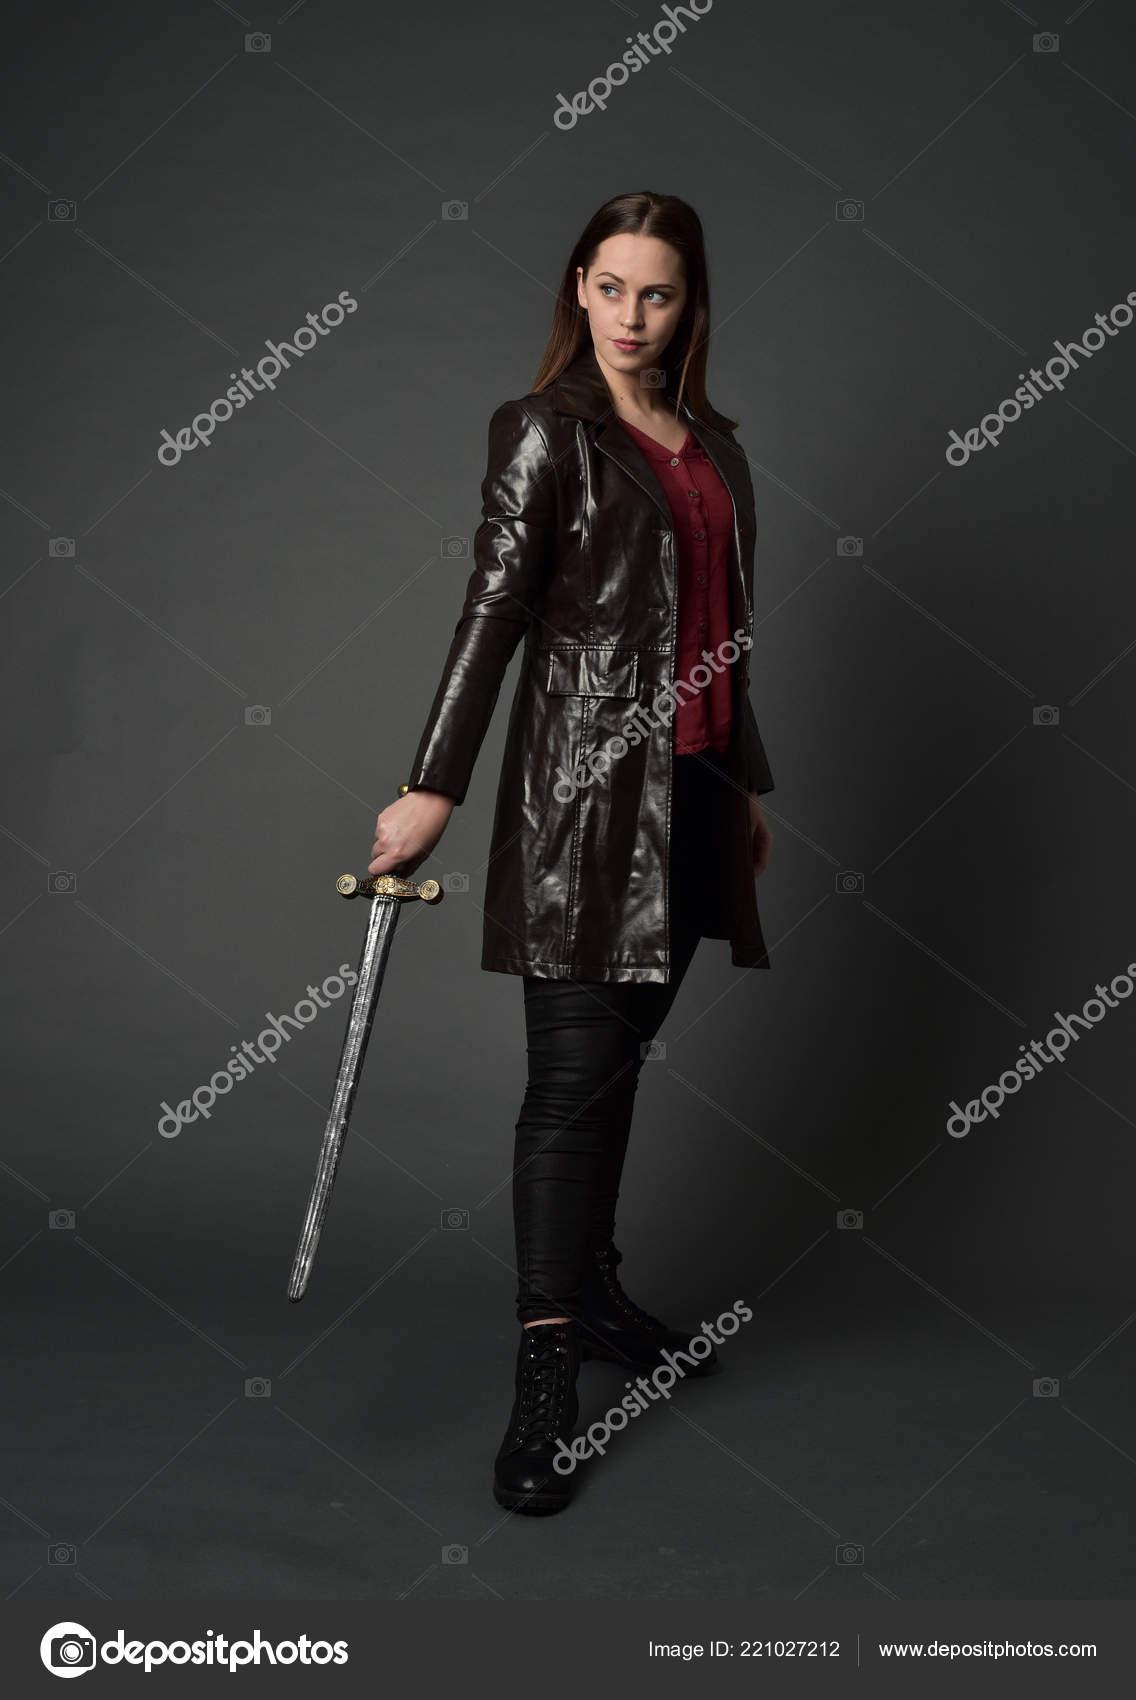 a6d09adc7a16 Ολόσωμο πορτρέτο μελαχρινή κοπέλα φορώντας κόκκινο δέρμα μεγάλη υποδοχή.  όρθια στάση